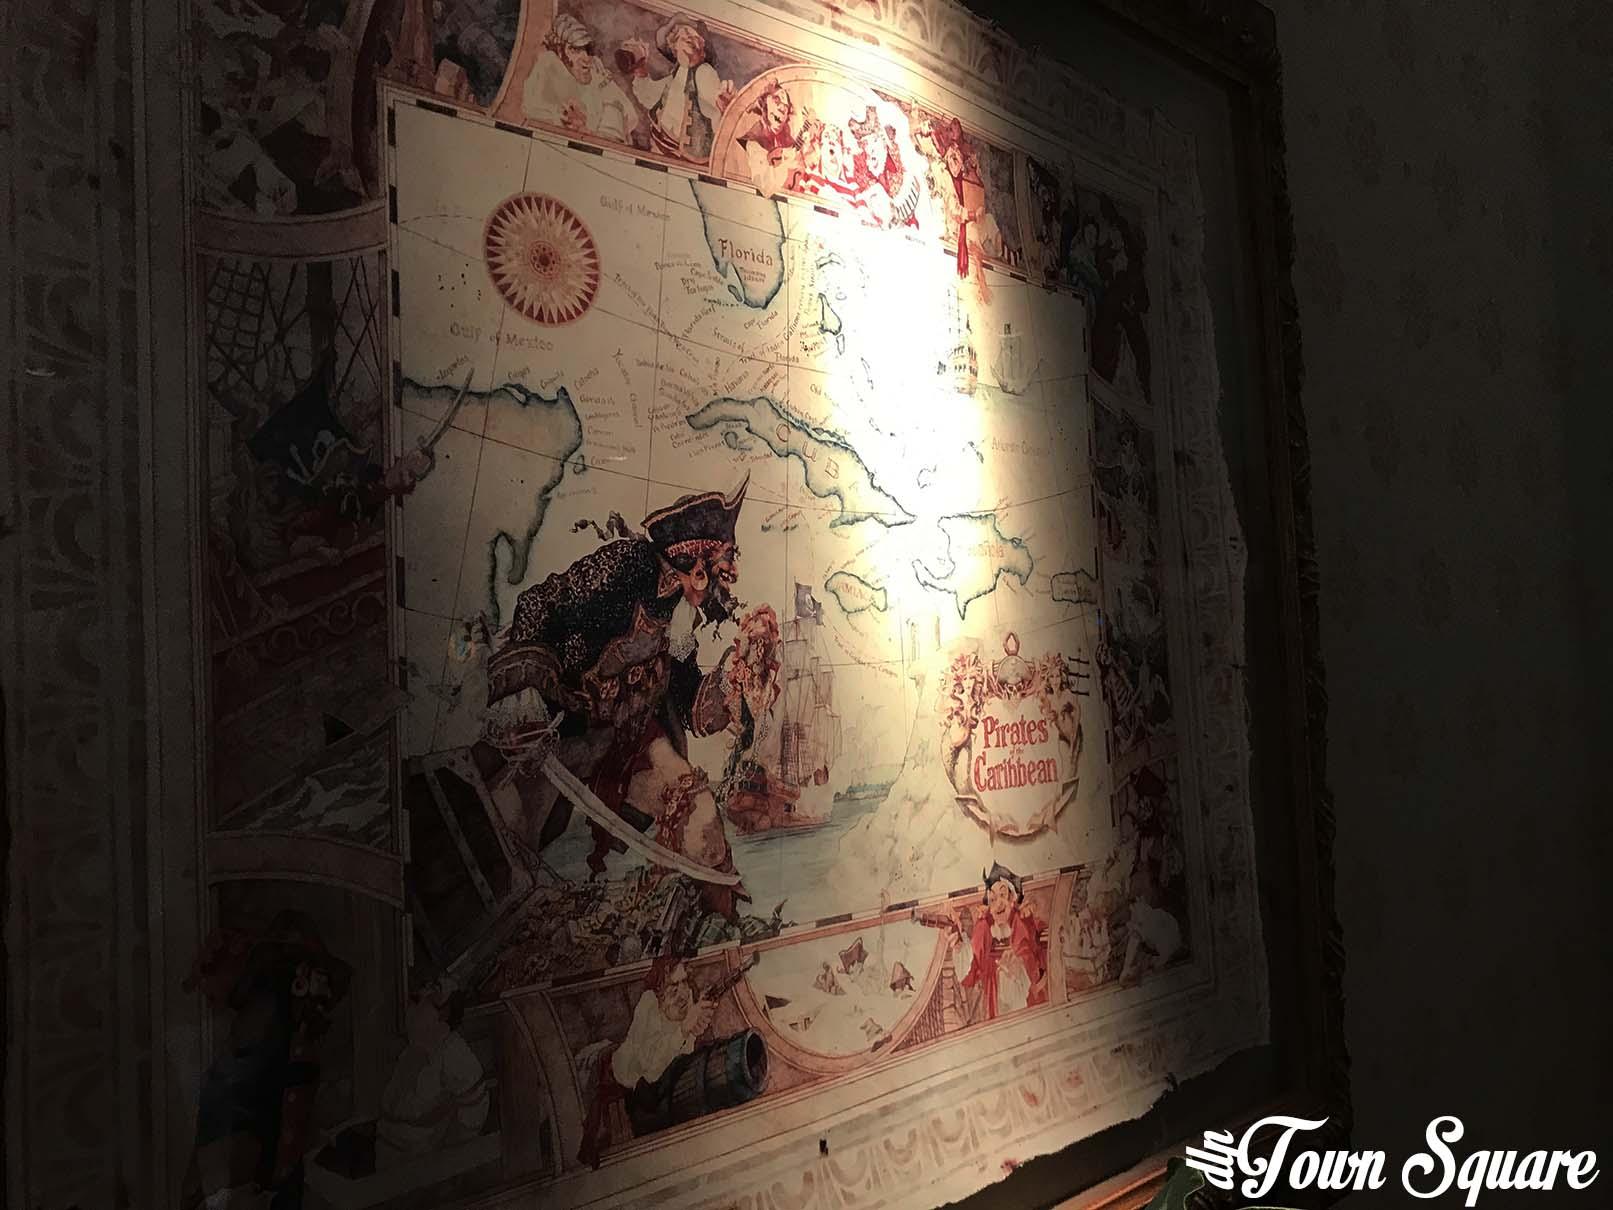 Pirates of the Caribbean concept art in the Disneyland Hotel at Disneyland Paris